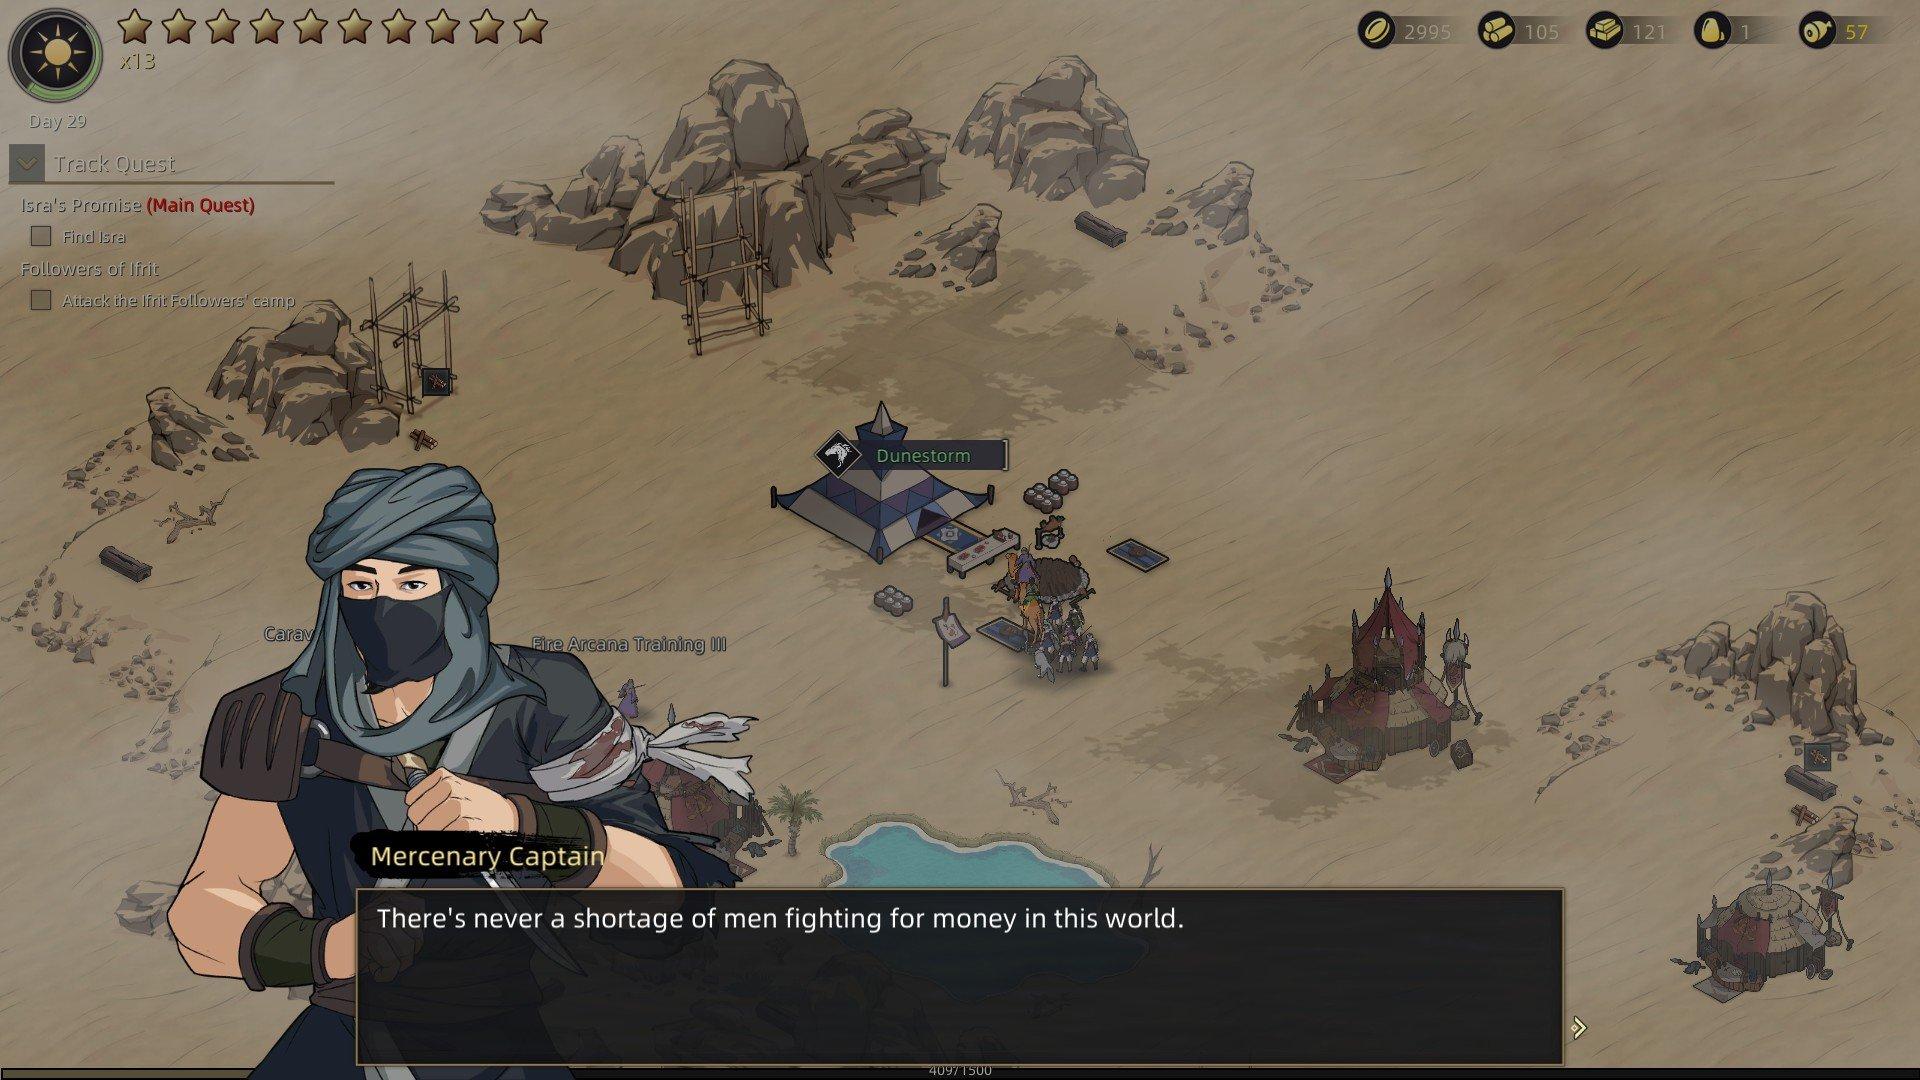 Sands of Salzaar - Mecenary Captain Recruiting